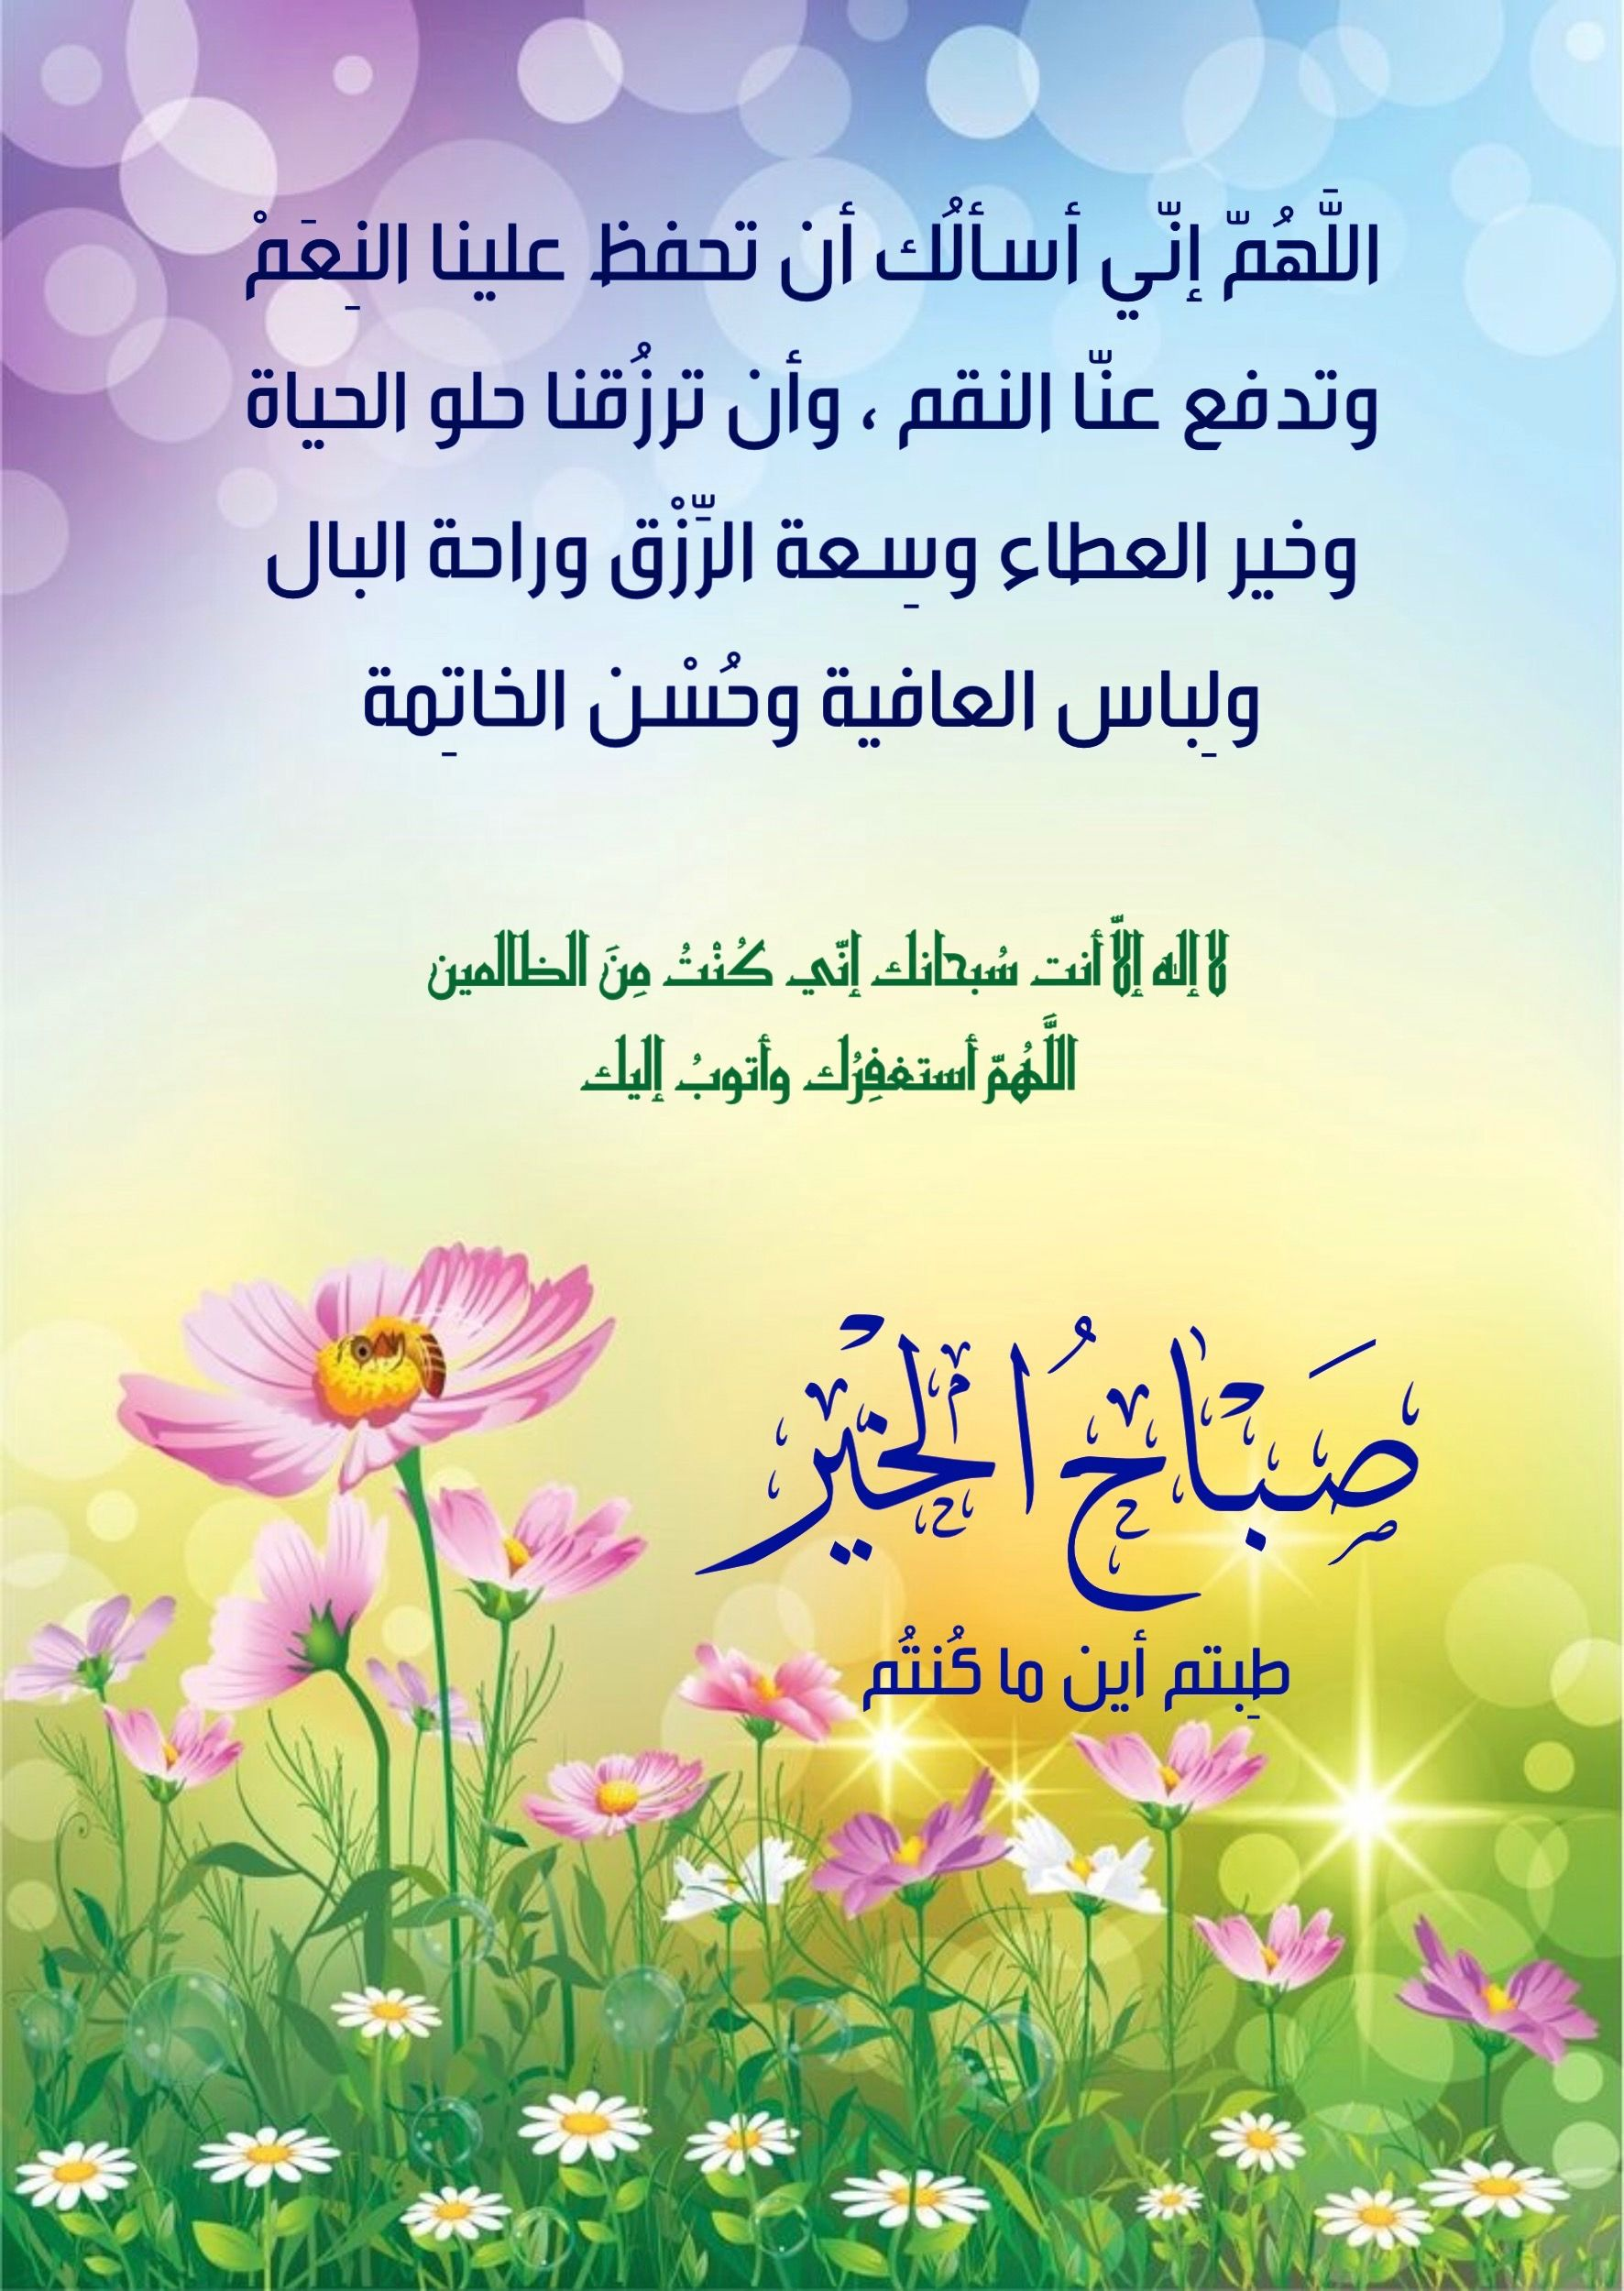 Pin By Amin Shahin On Duaa Good Morning Photos Good Morning Beautiful Images Good Morning Picture